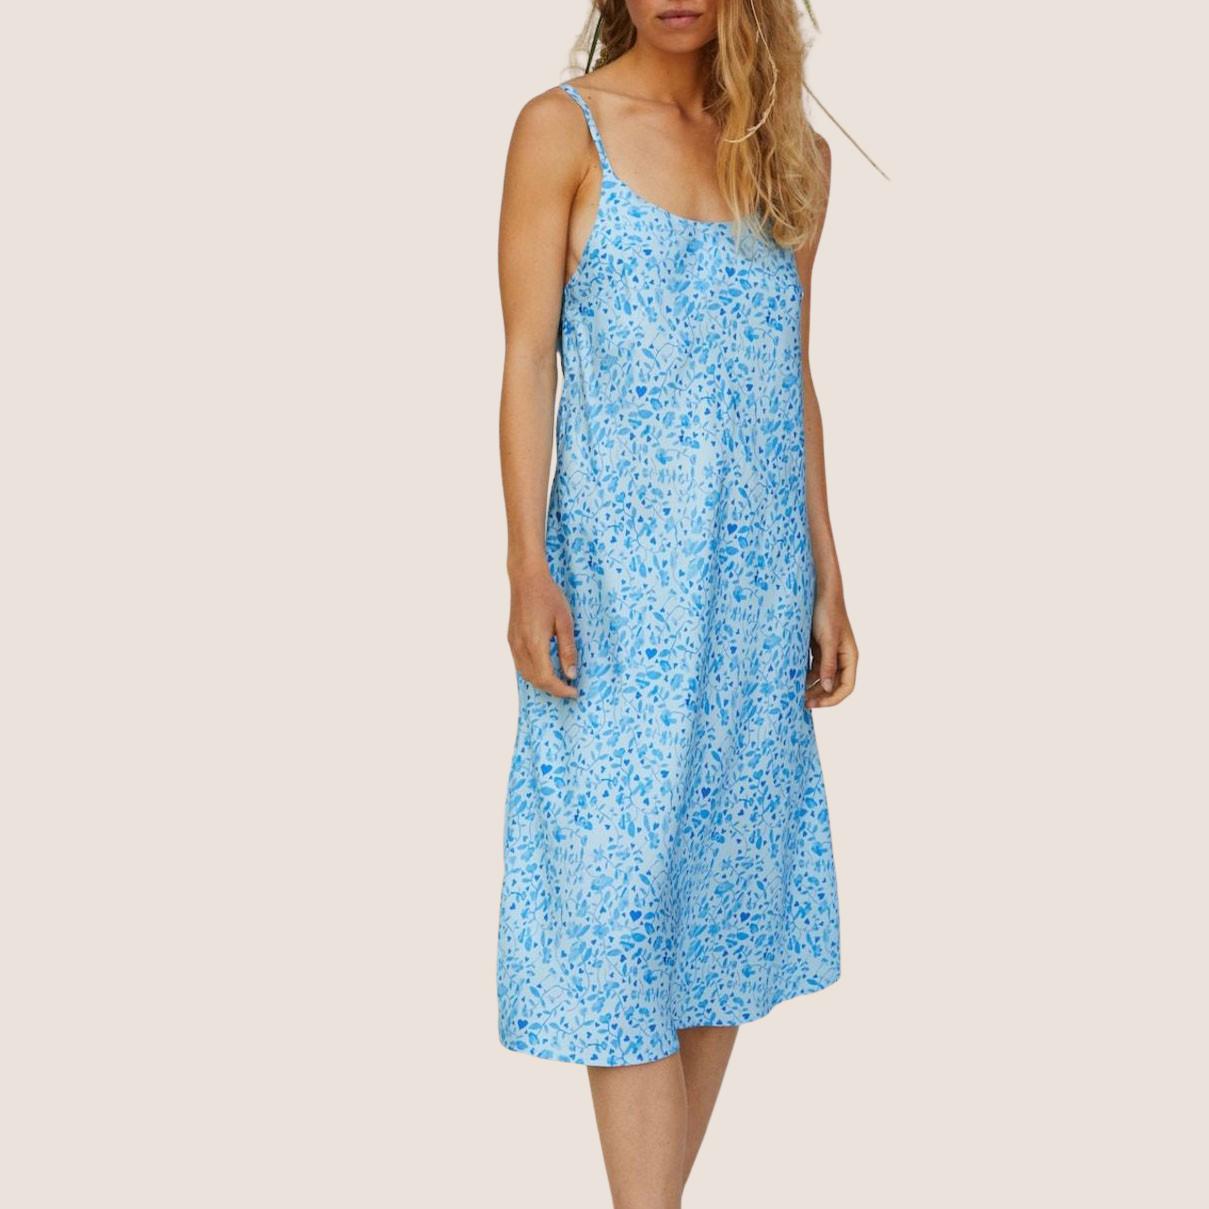 Leva Camisole Dress